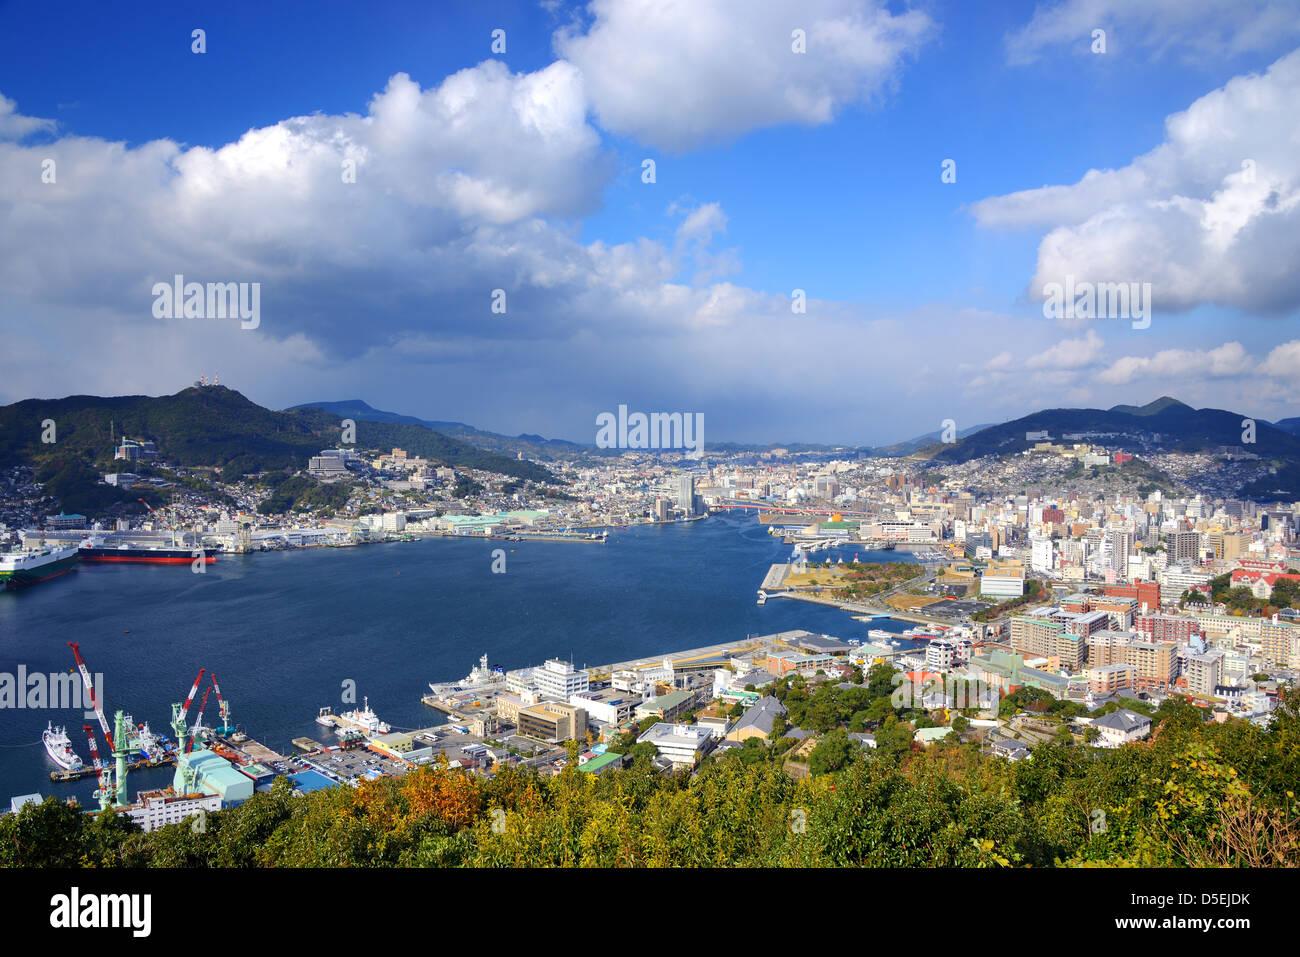 View of Nagasaki Bay, Japan. - Stock Image